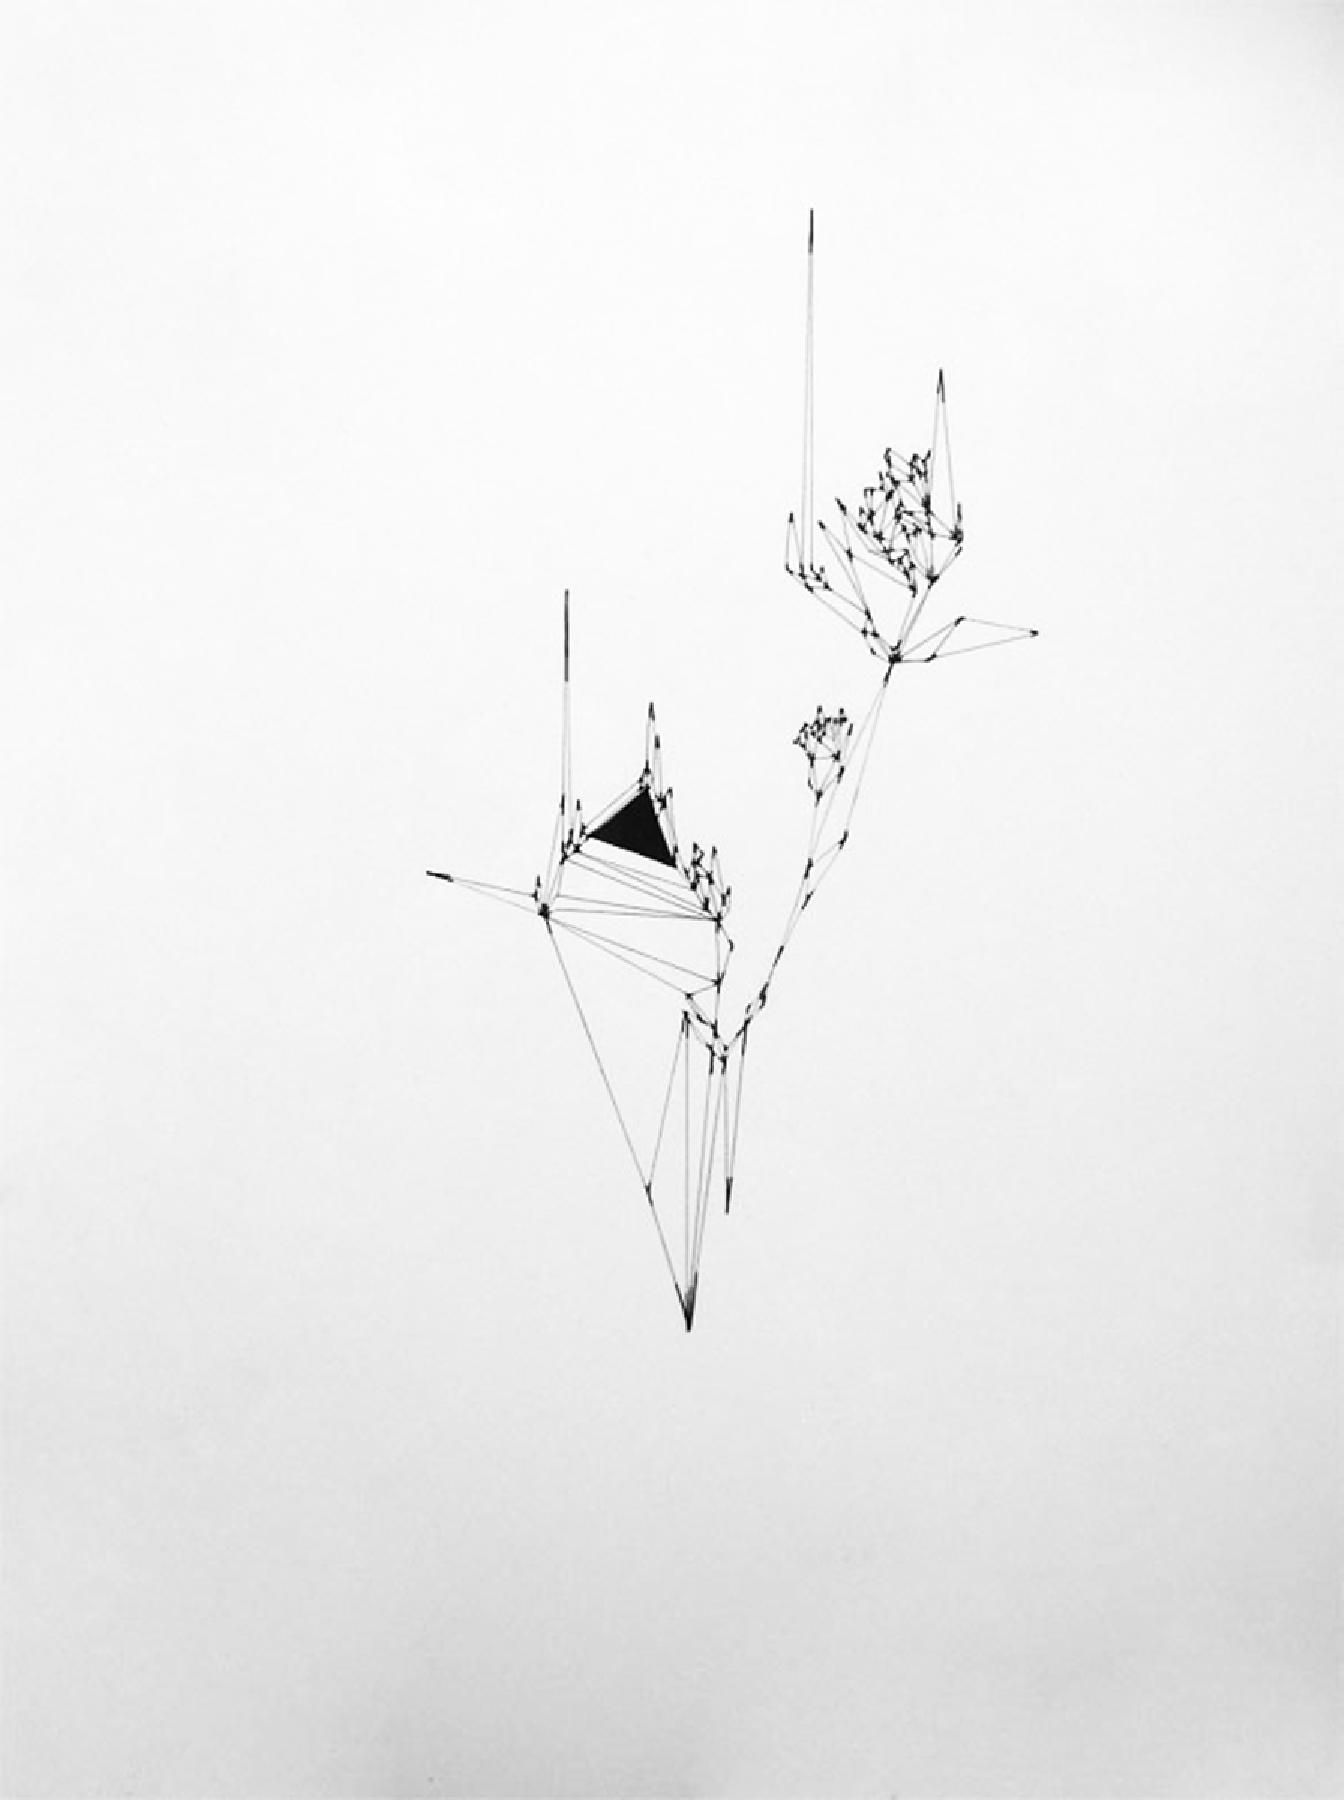 Sirens, 2011